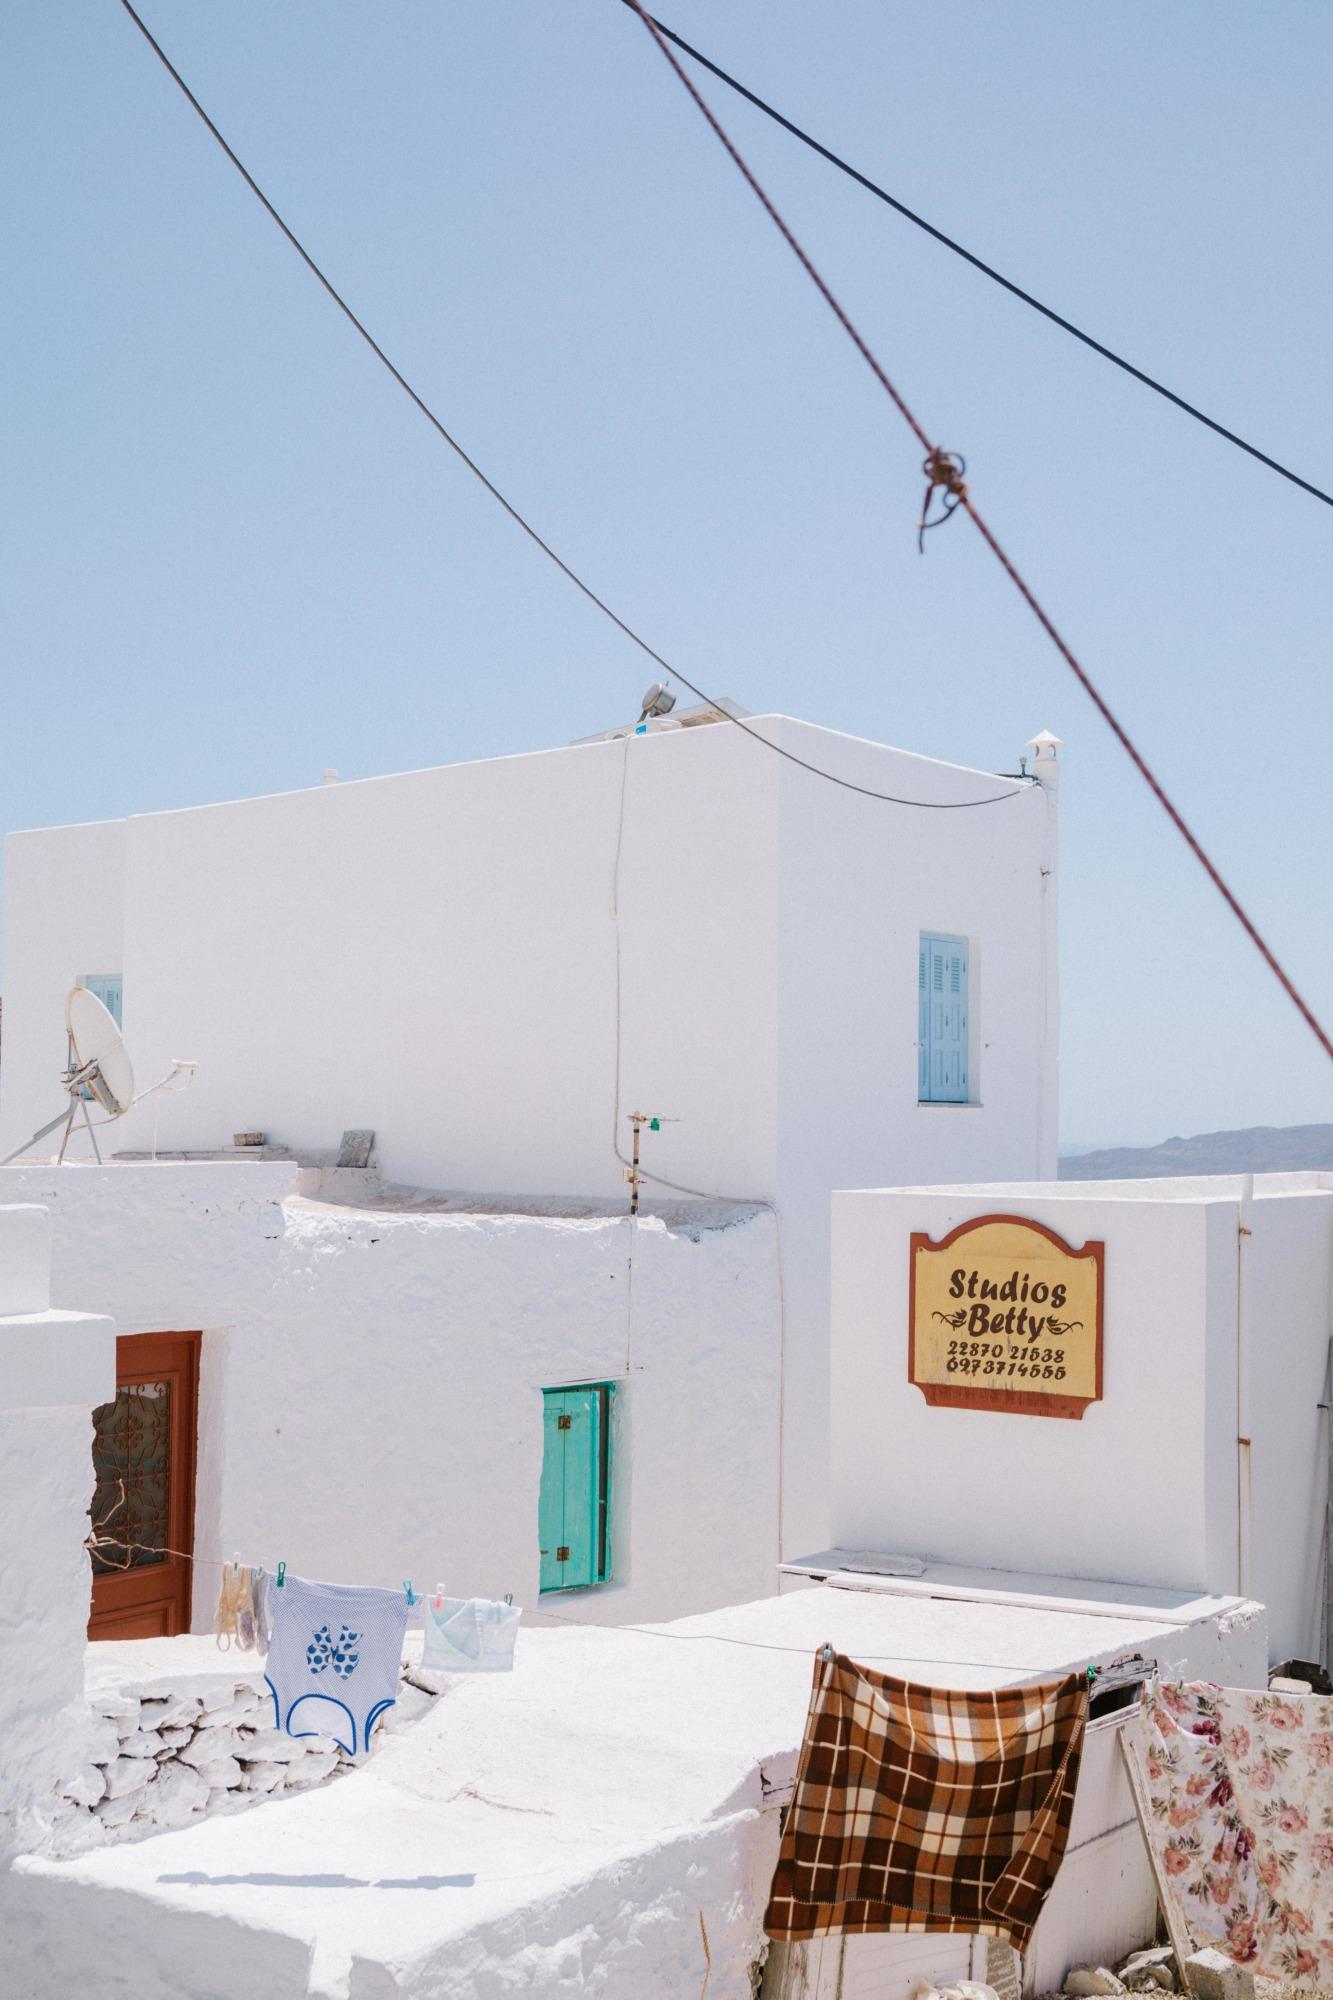 Visiter Plaka en Grèce - Blondie Baby blog voyage